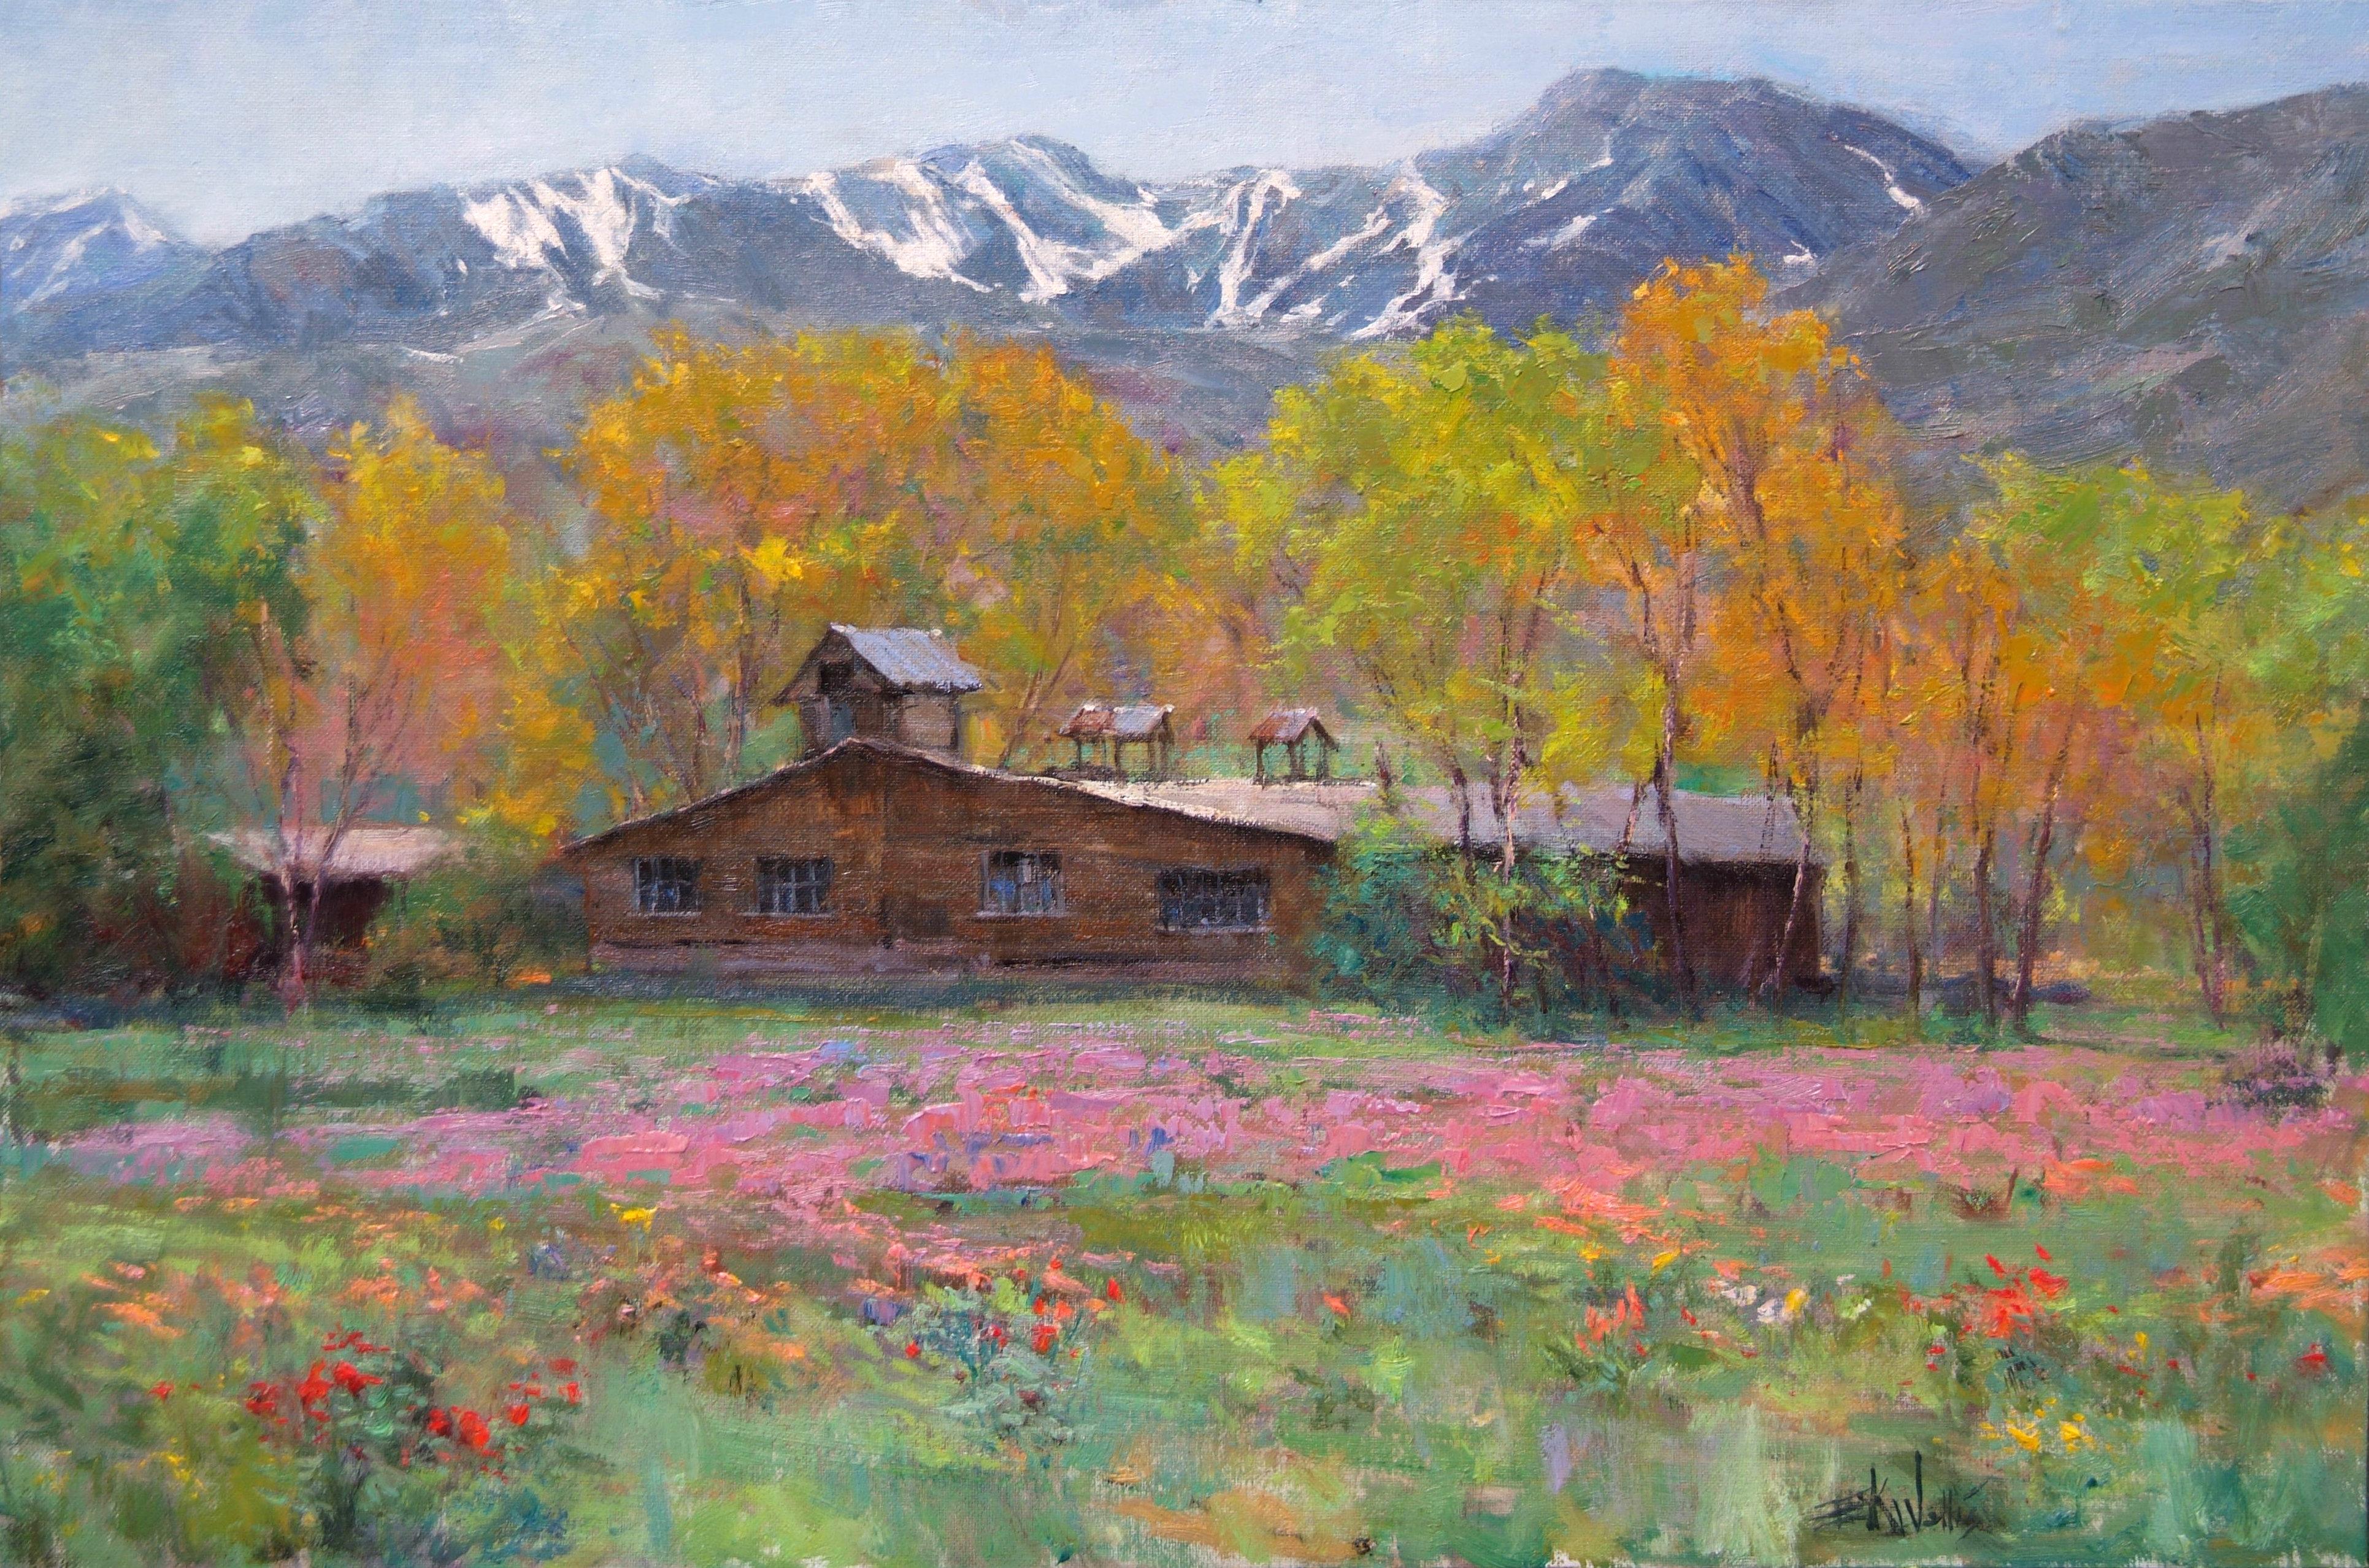 Eric wallis - A Spring Saturday